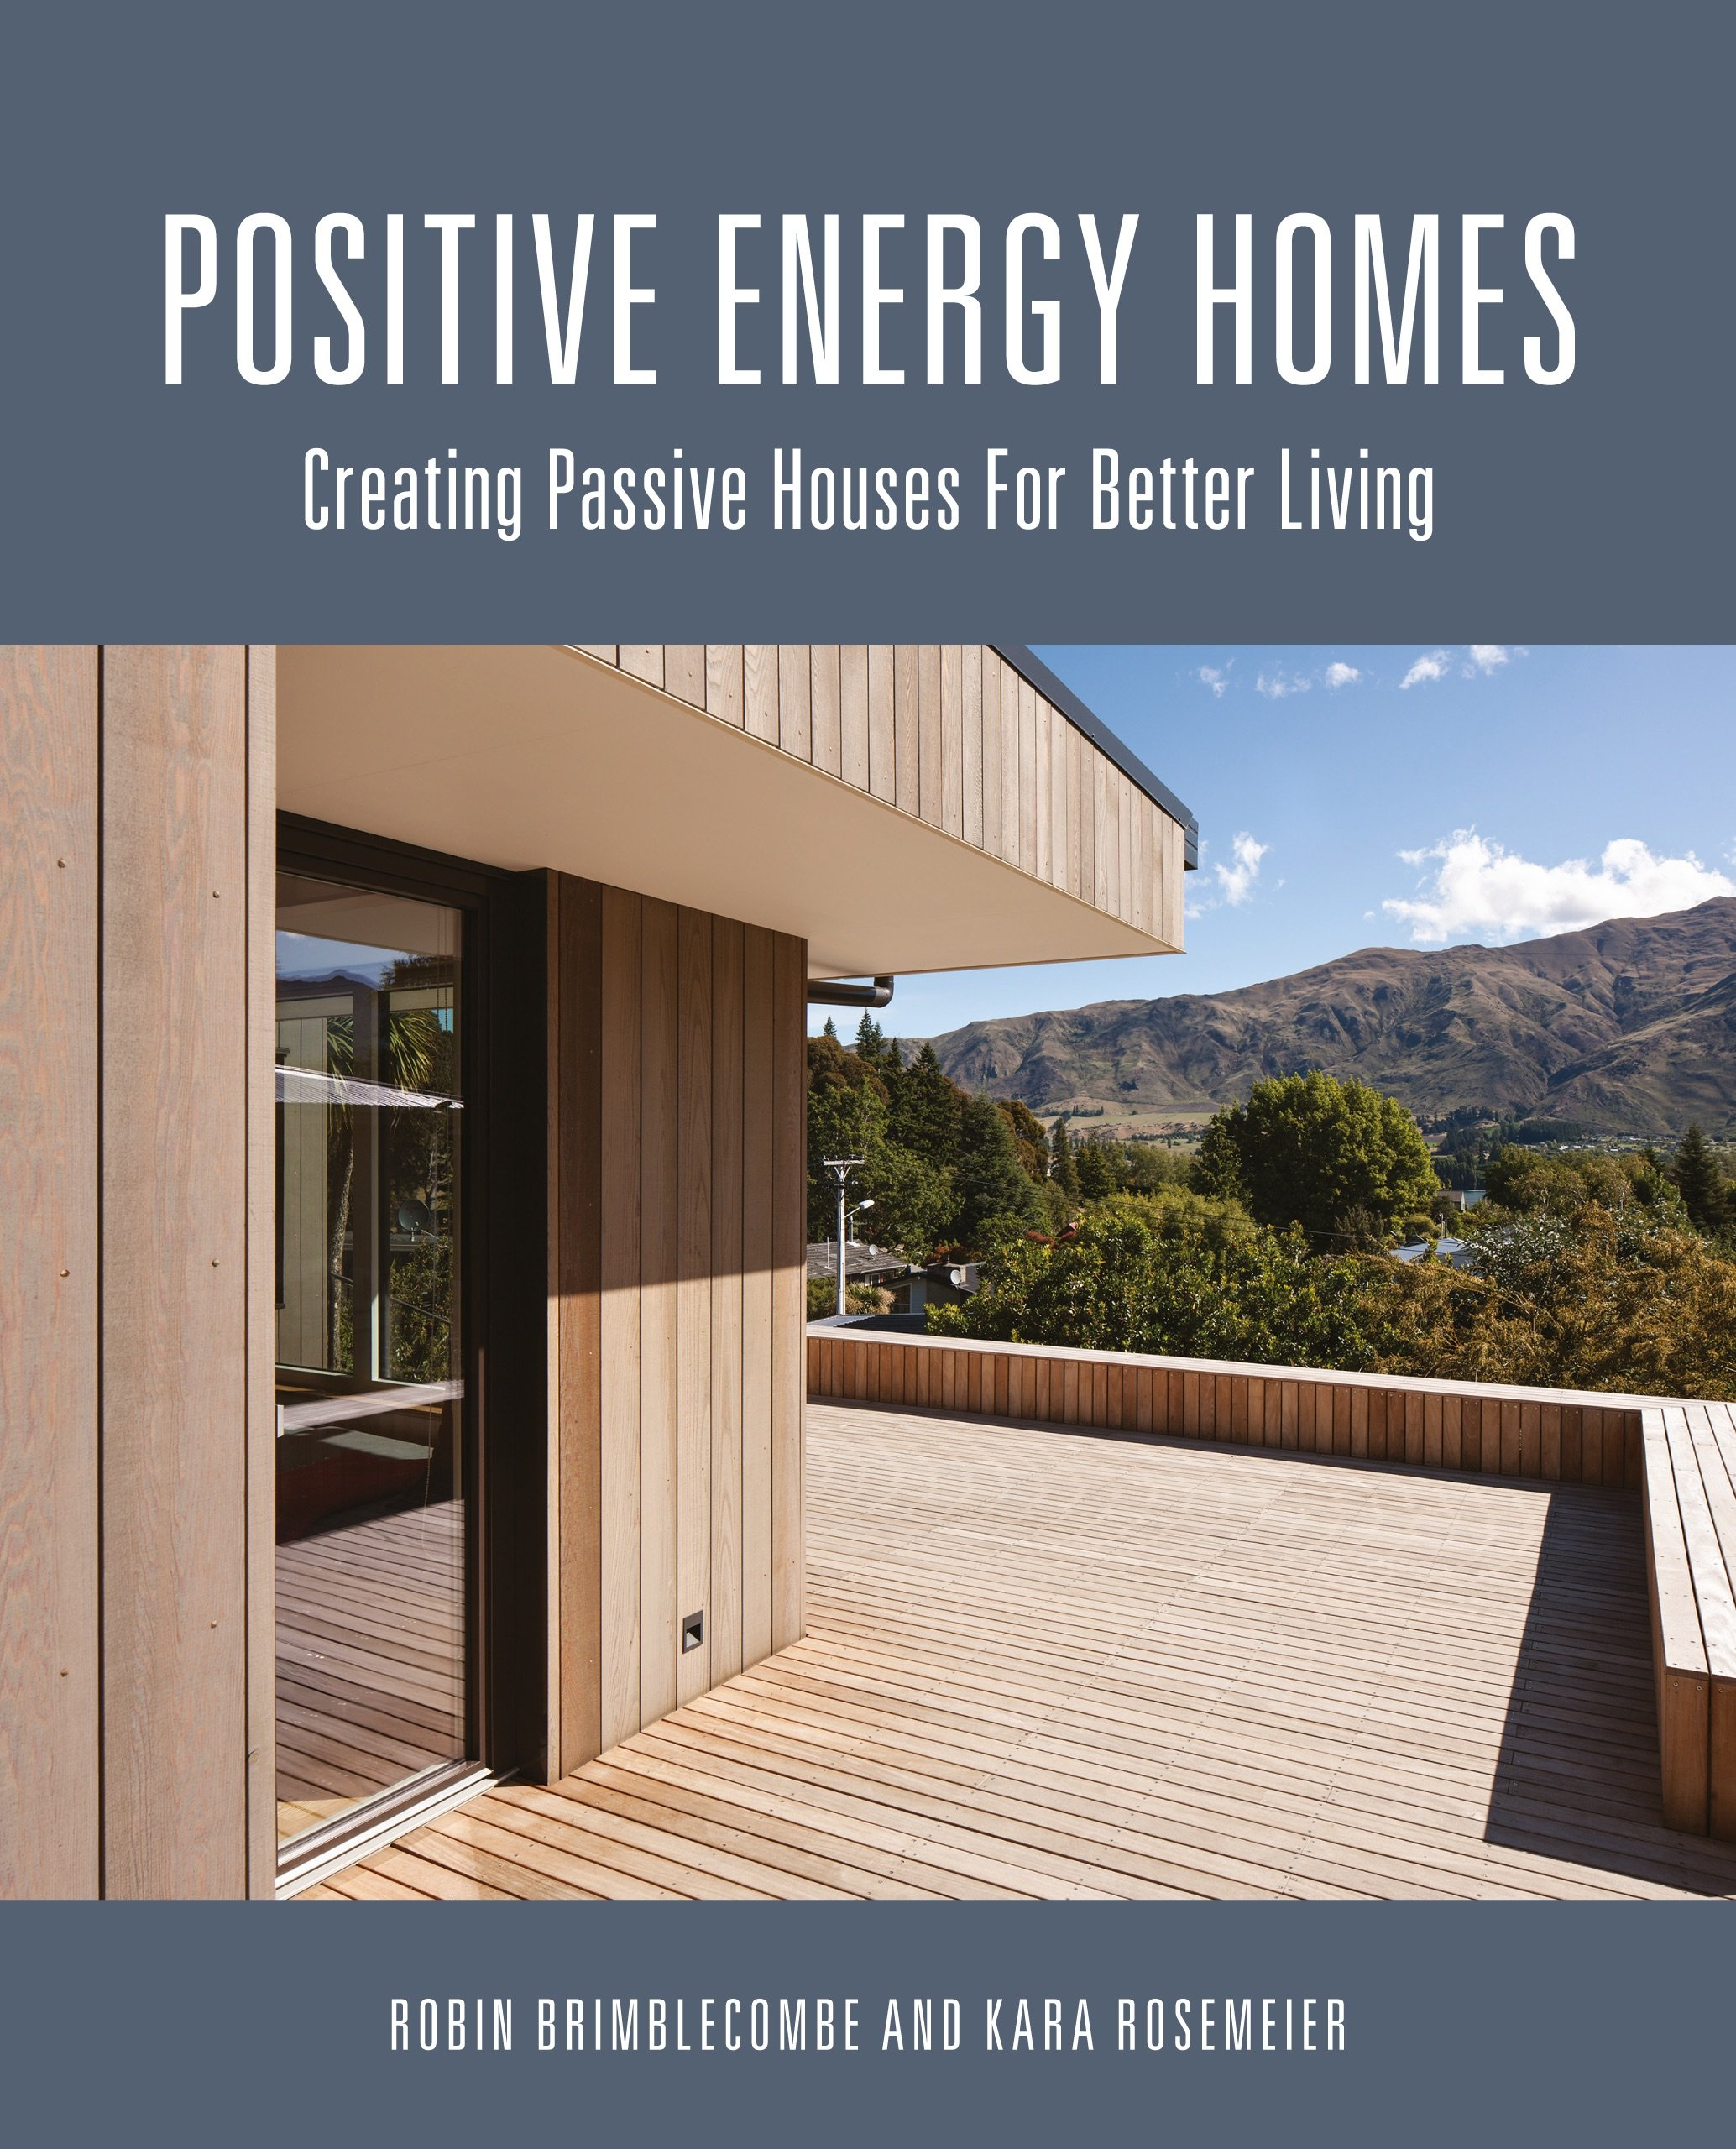 Positive Energy Homes: Creating Passive Houses For Better Living: Robin  Brimblecombe, Kara Rosemeier: 9781486303762: Amazon.com: Books